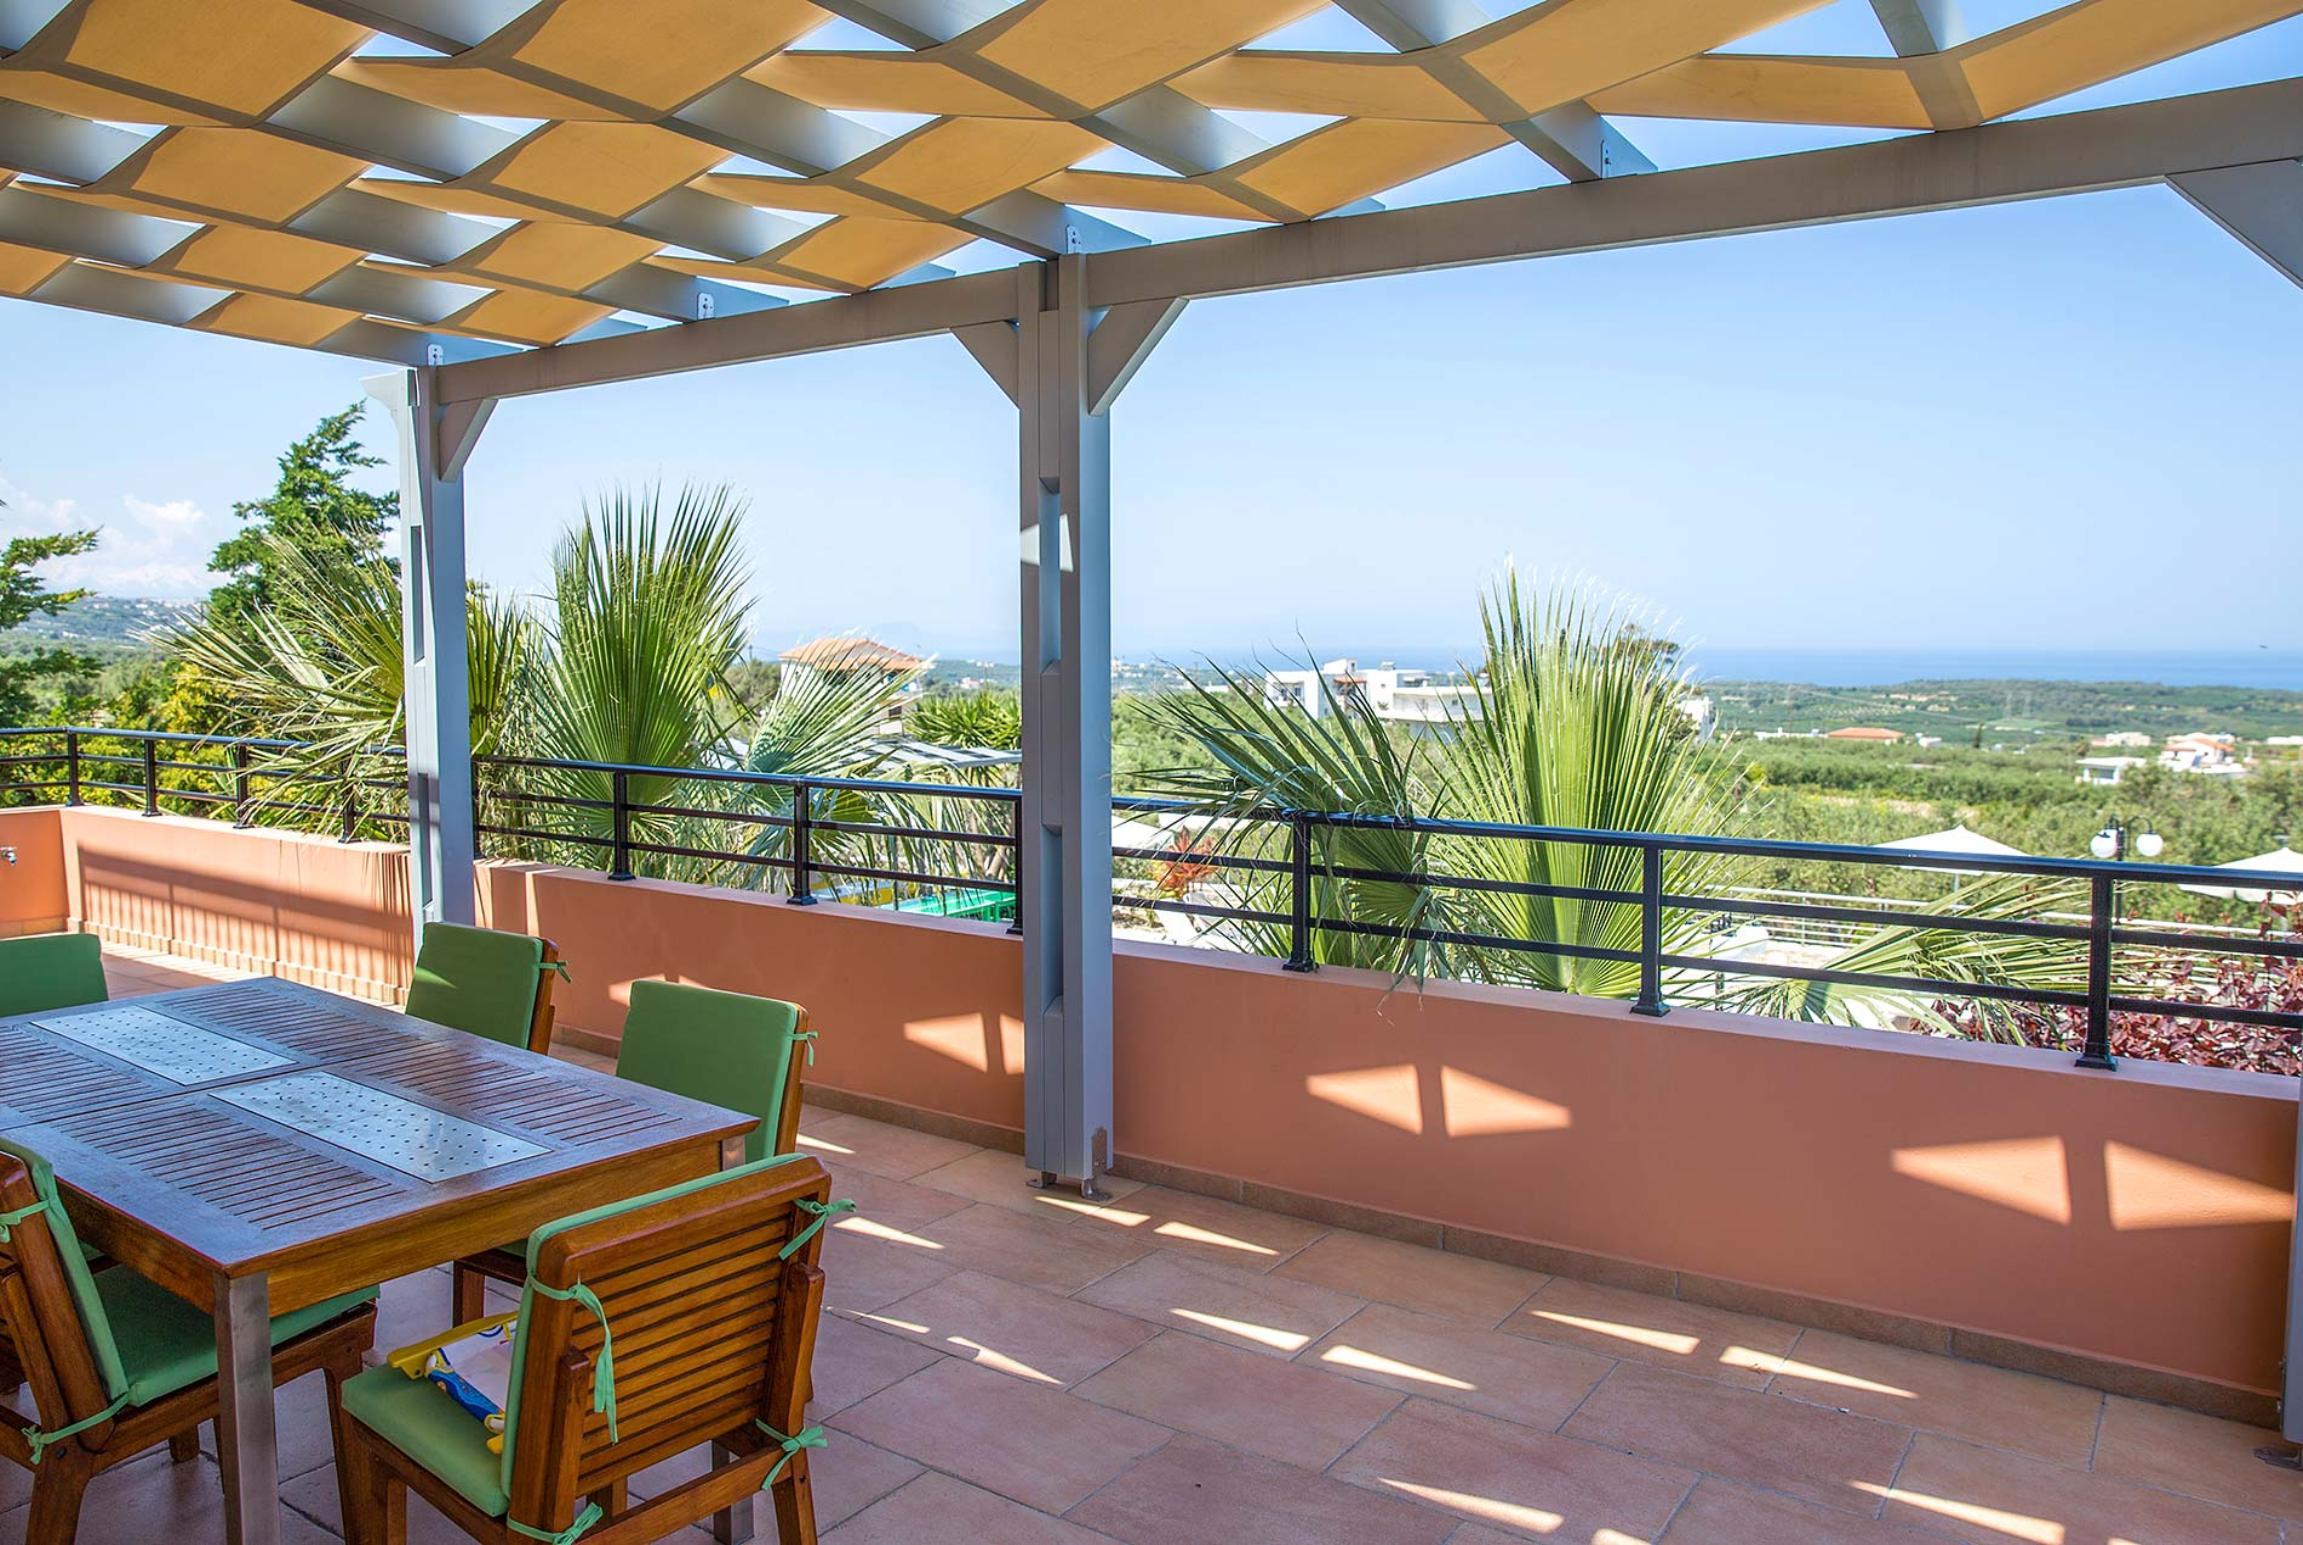 Ferienhaus Kyveli (2654321), Rethymno, Kreta Nordküste, Kreta, Griechenland, Bild 23